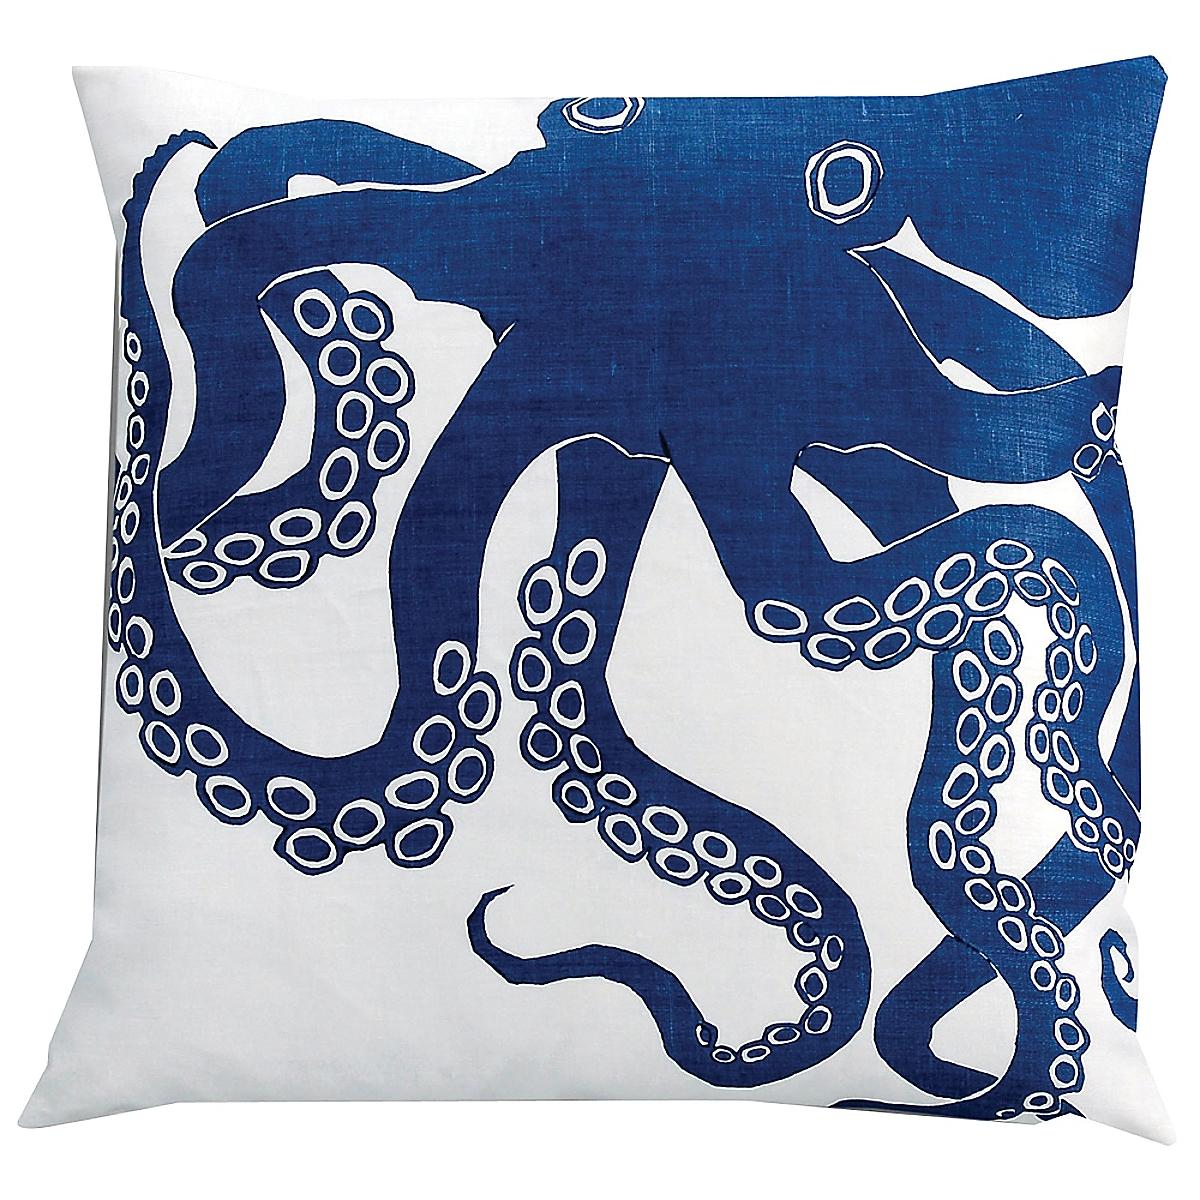 "20"" x 20"" - Octopus Pillow: Marine on White Linen"